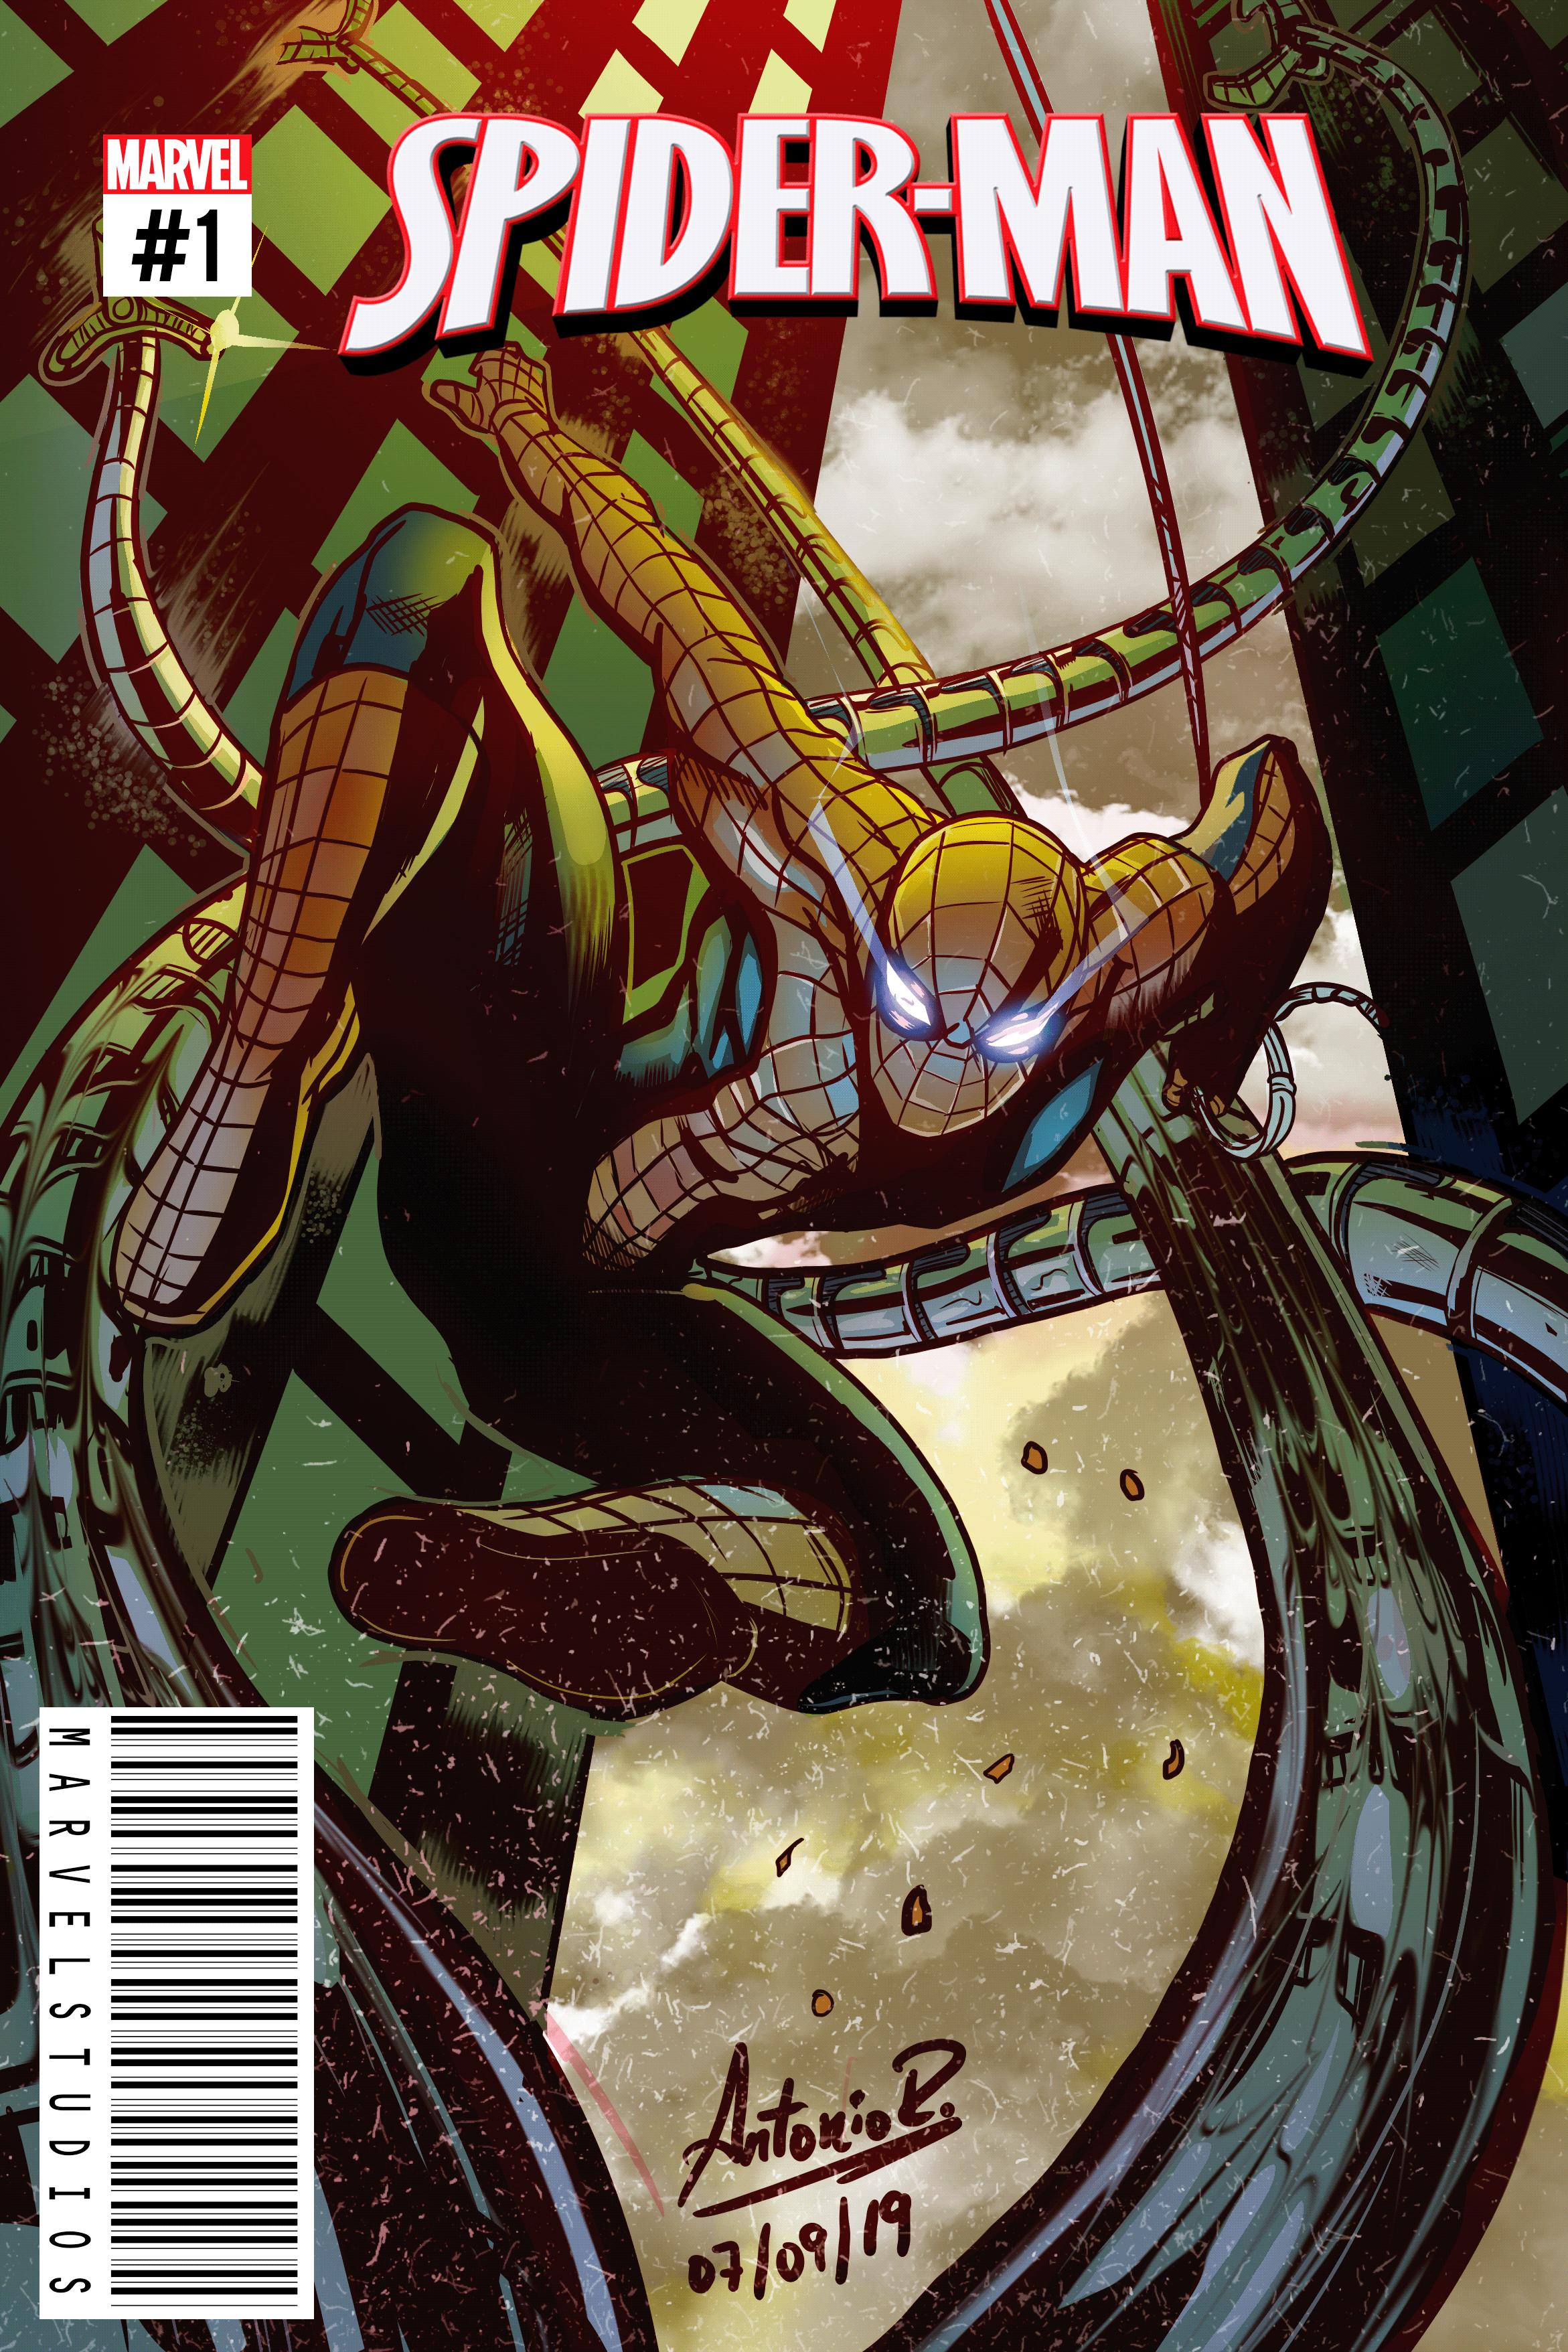 Spider Man Spiderman Spiderman Comic Marvel Spiderman